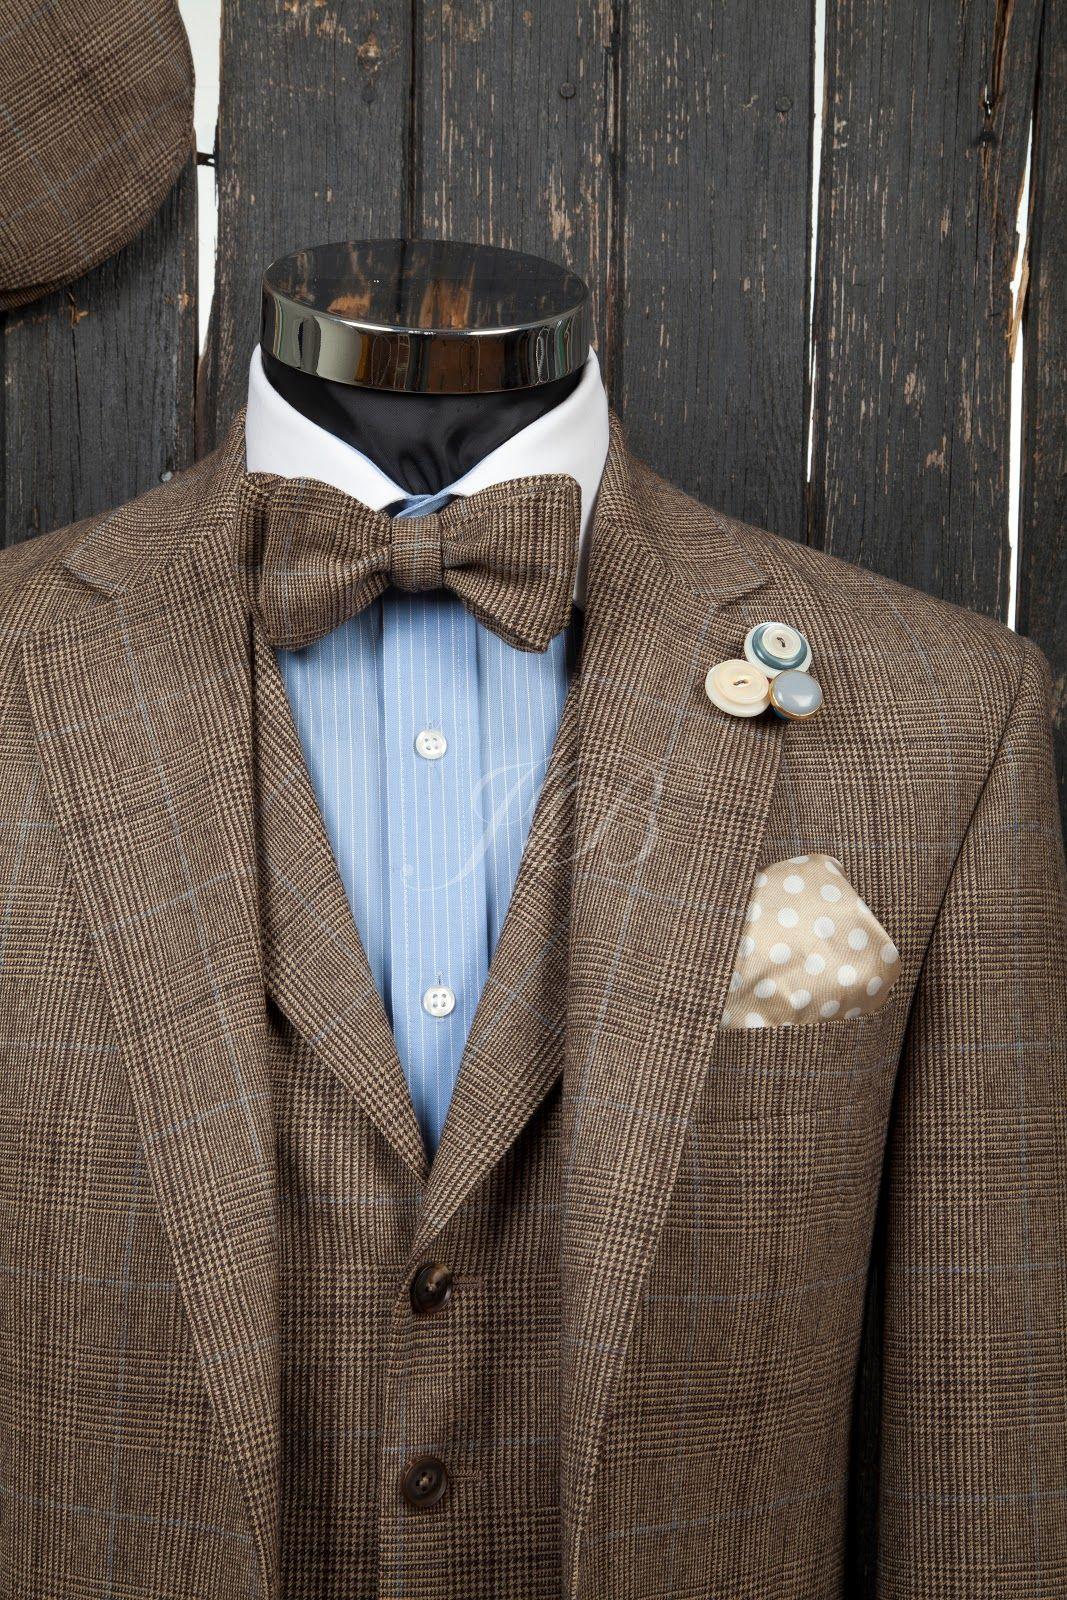 wedding groomsmen tweed | wedding suit with a bow tie, vintage ...